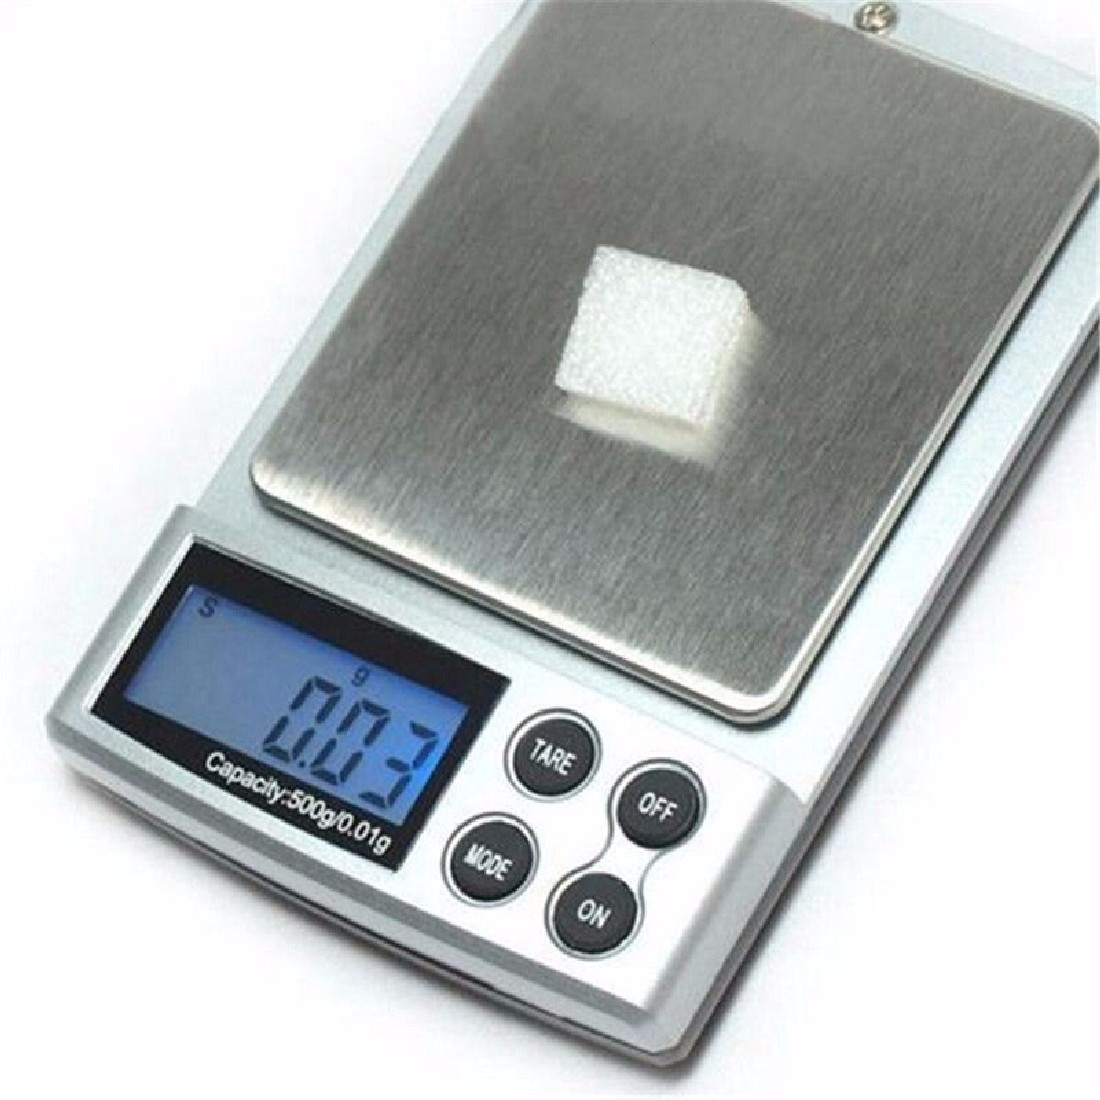 1pc 500g x 0.01g Escala de precisión digital Oro Plata Joyería - Instrumentos de medición - foto 1